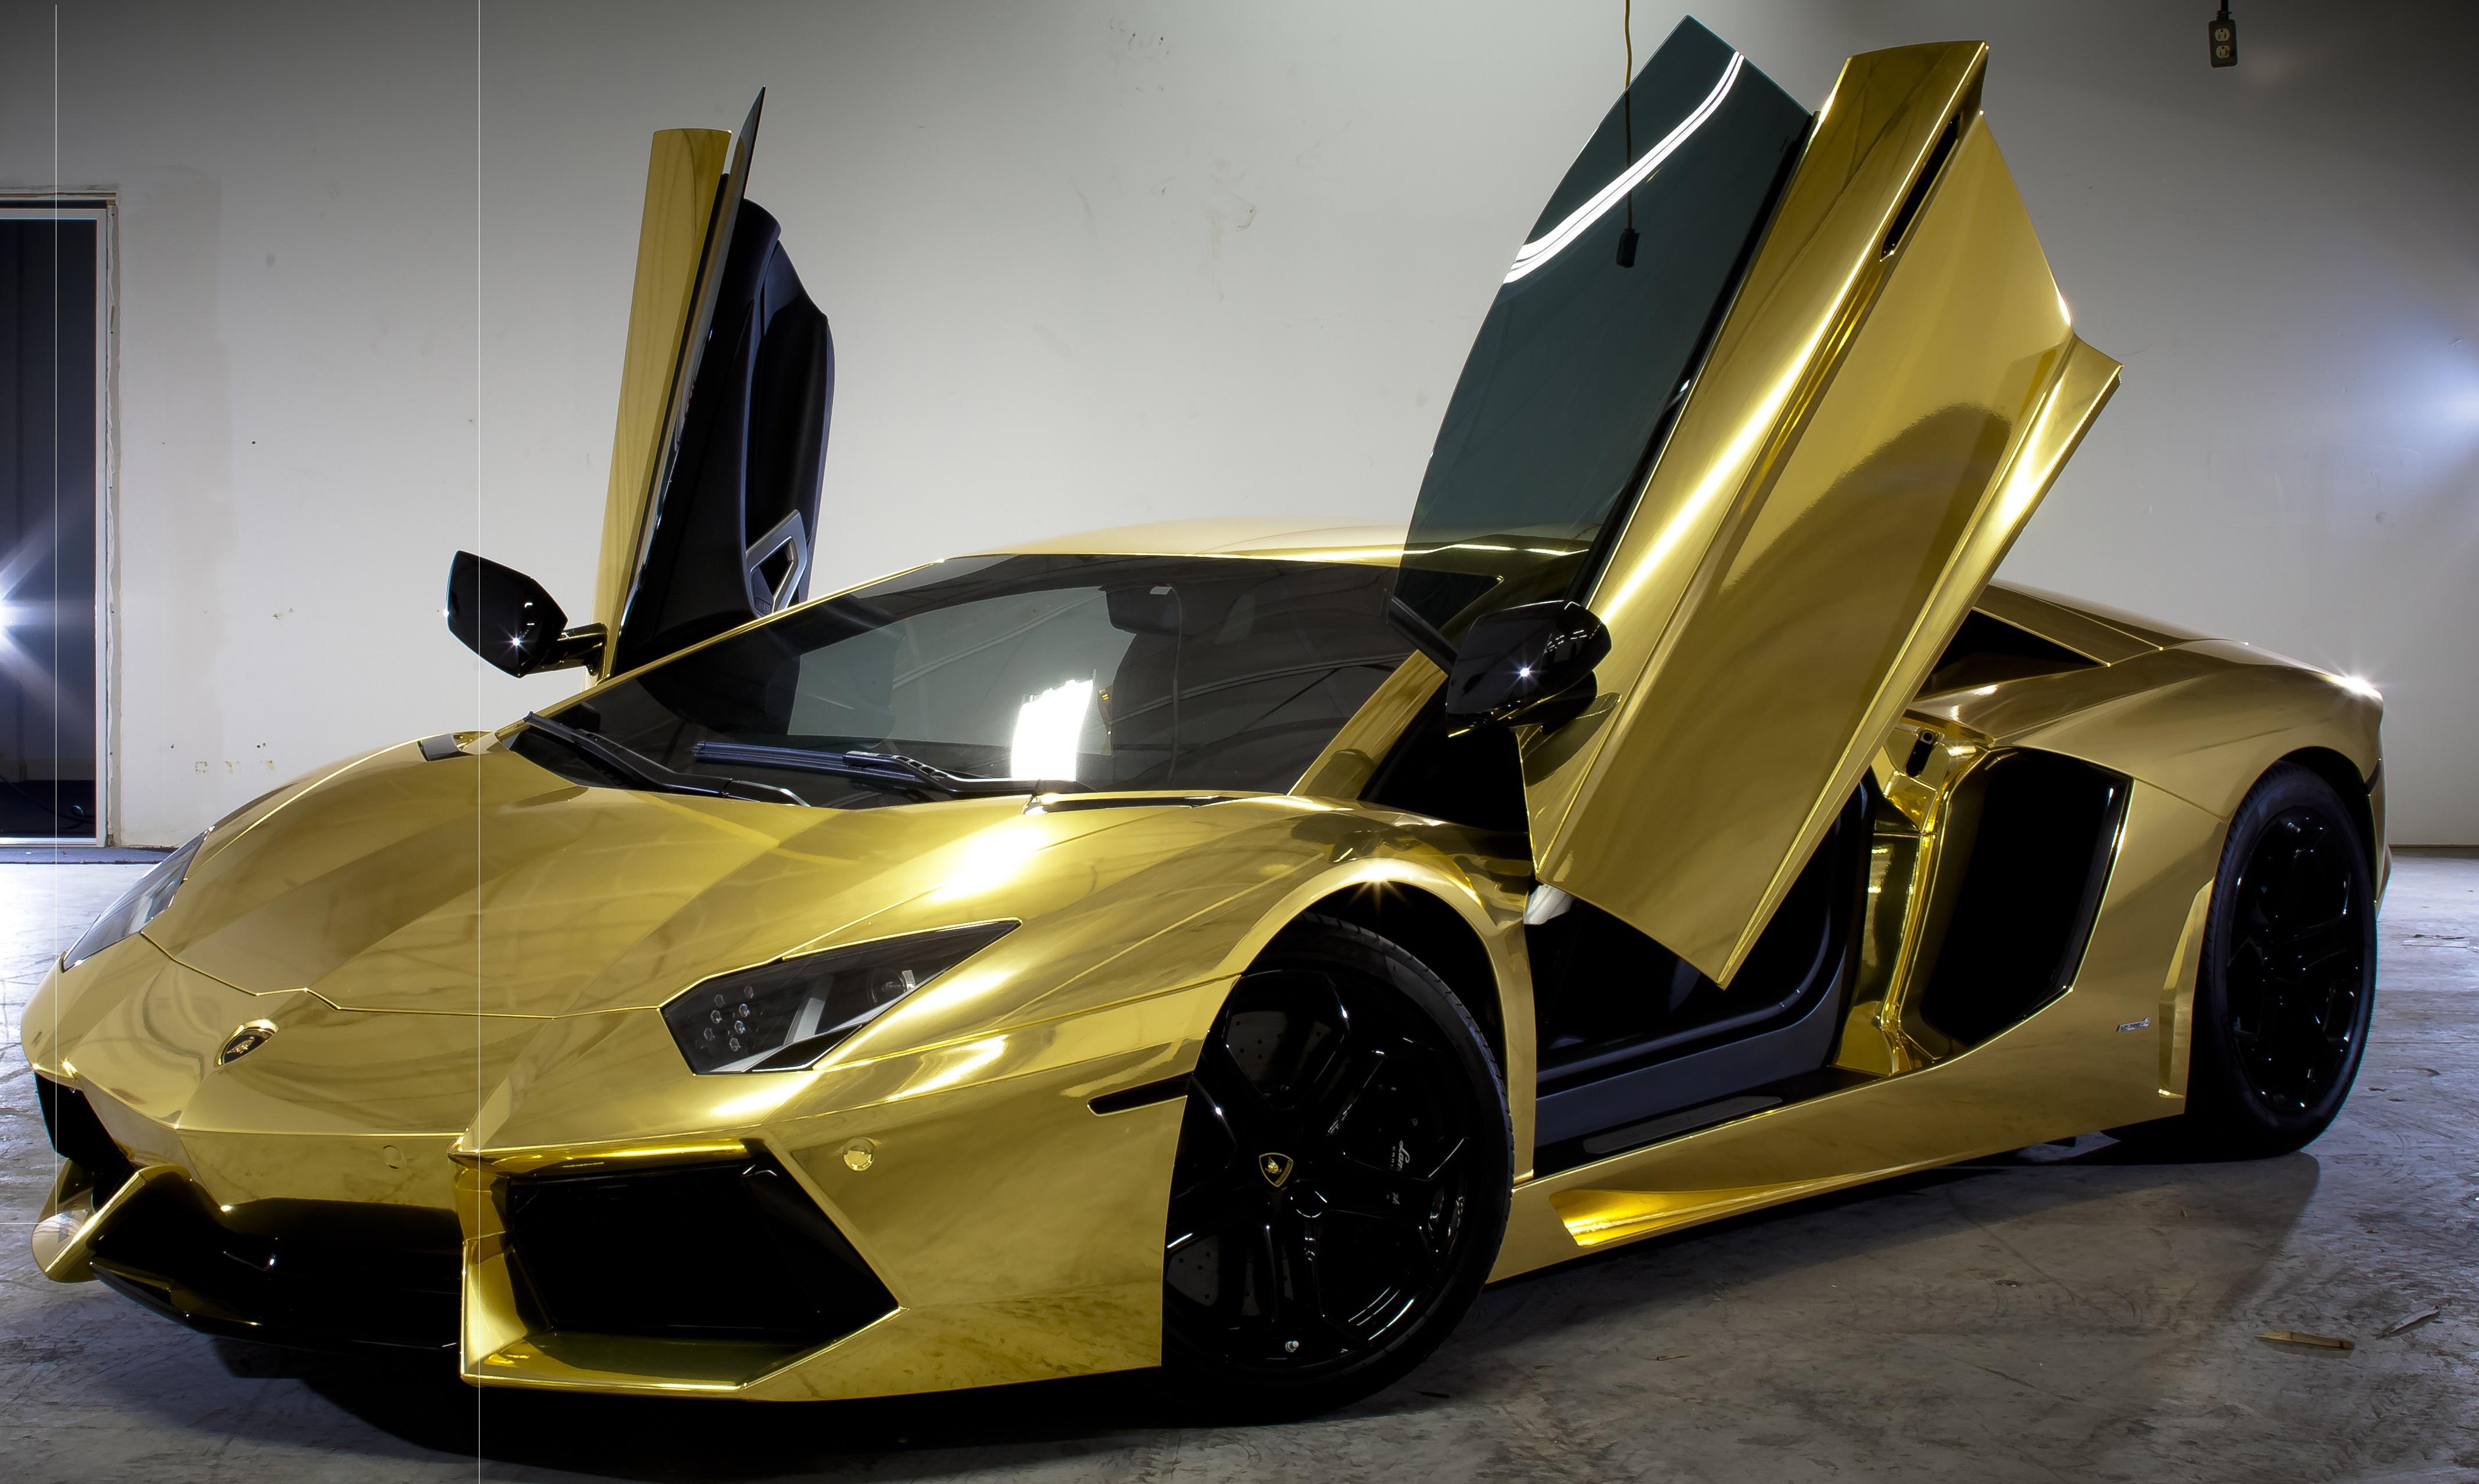 Hd Gold Lamborghini Hd Wallpaper Download